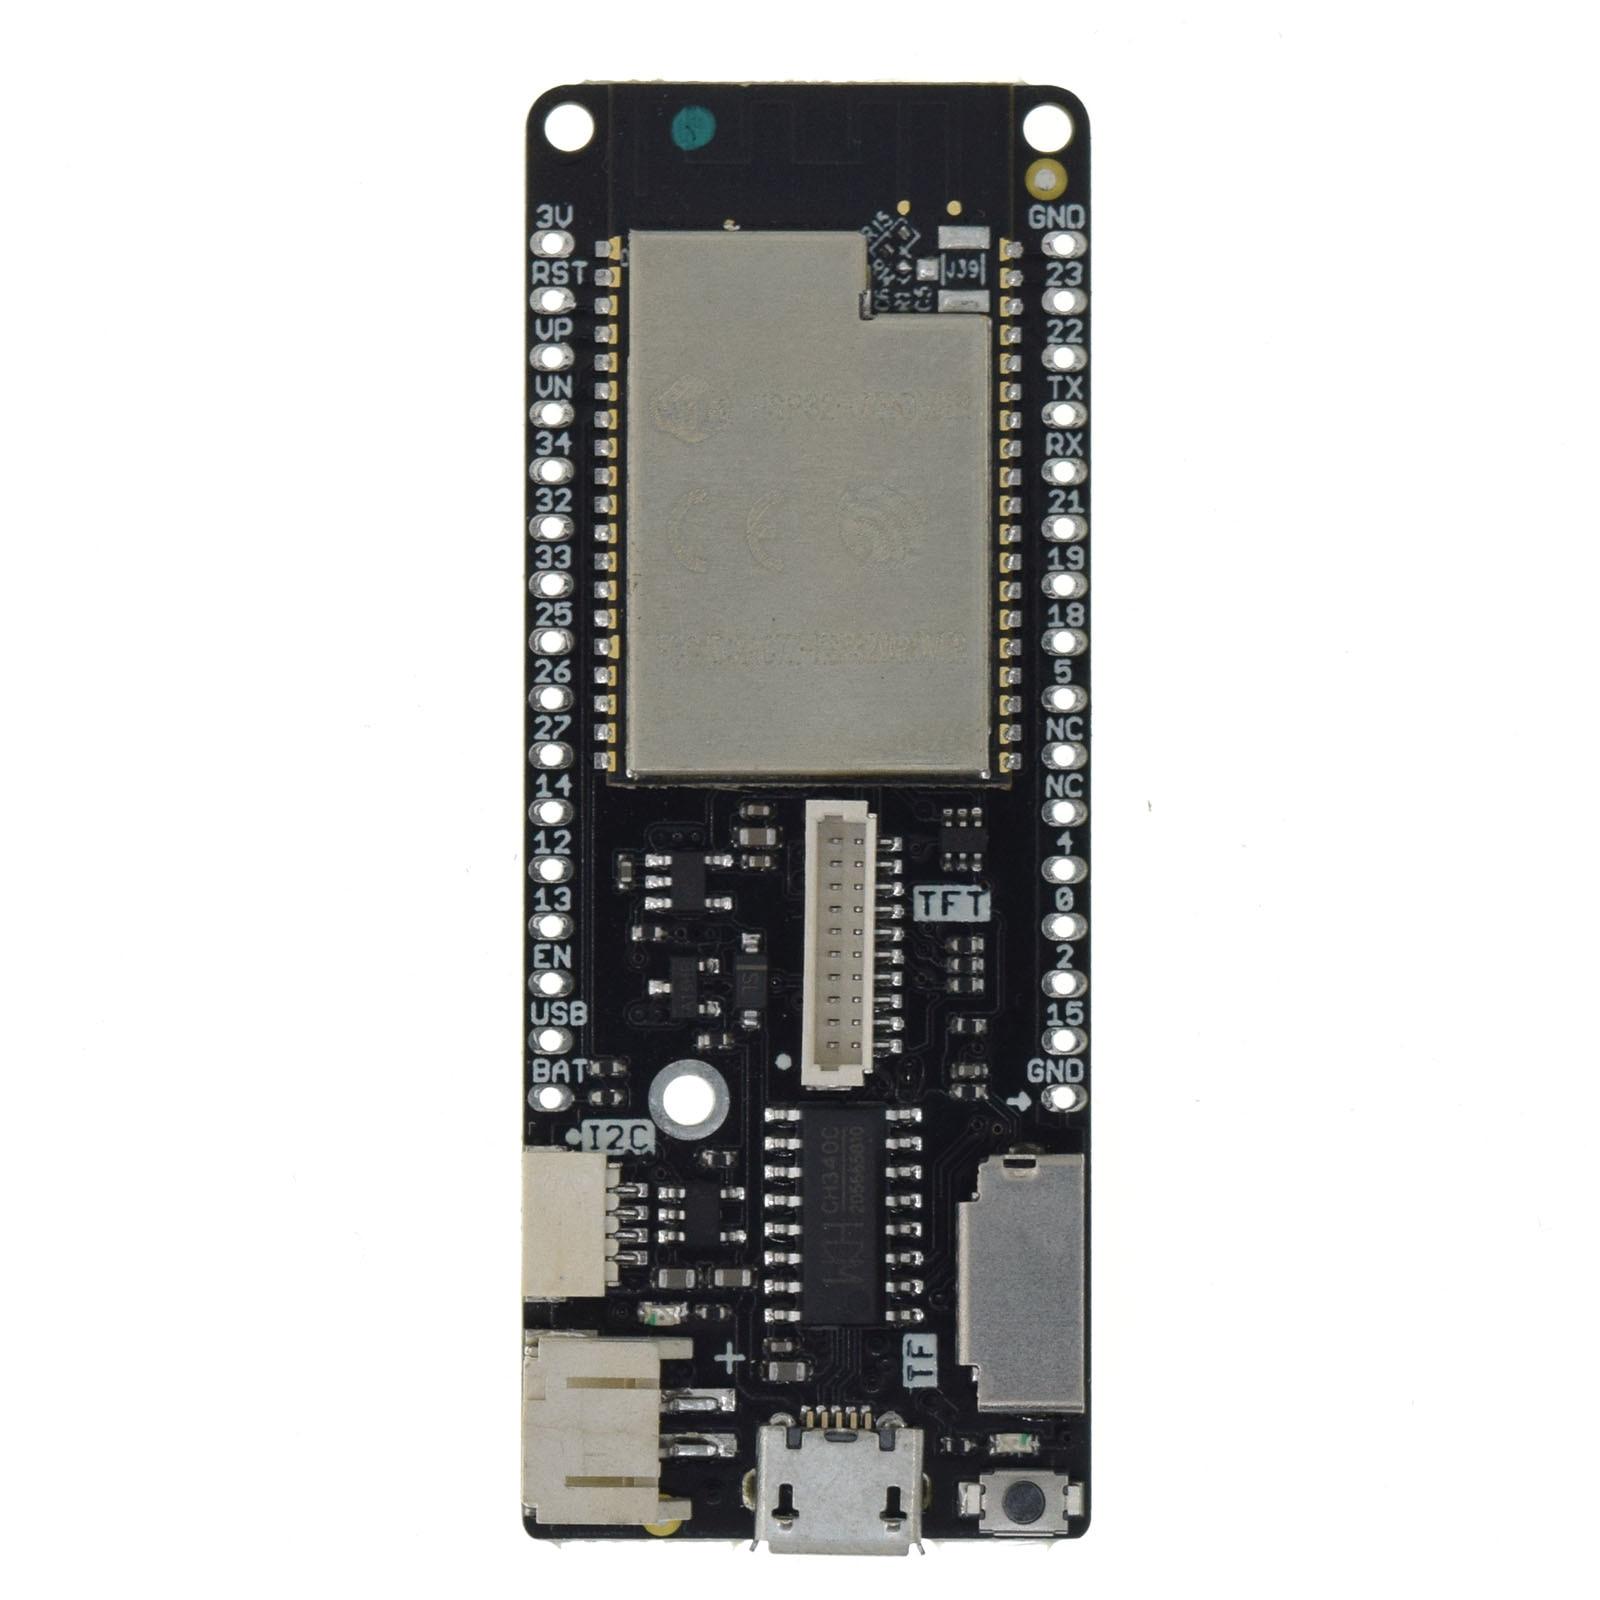 Плата LOLIN D32 Pro V2.0.0-Wi-Fi и bluetooth, на базе esp32 Rev1, 16 Мб, 8 Мб, 4 МБ, флэш-память PSRAM, микропитон